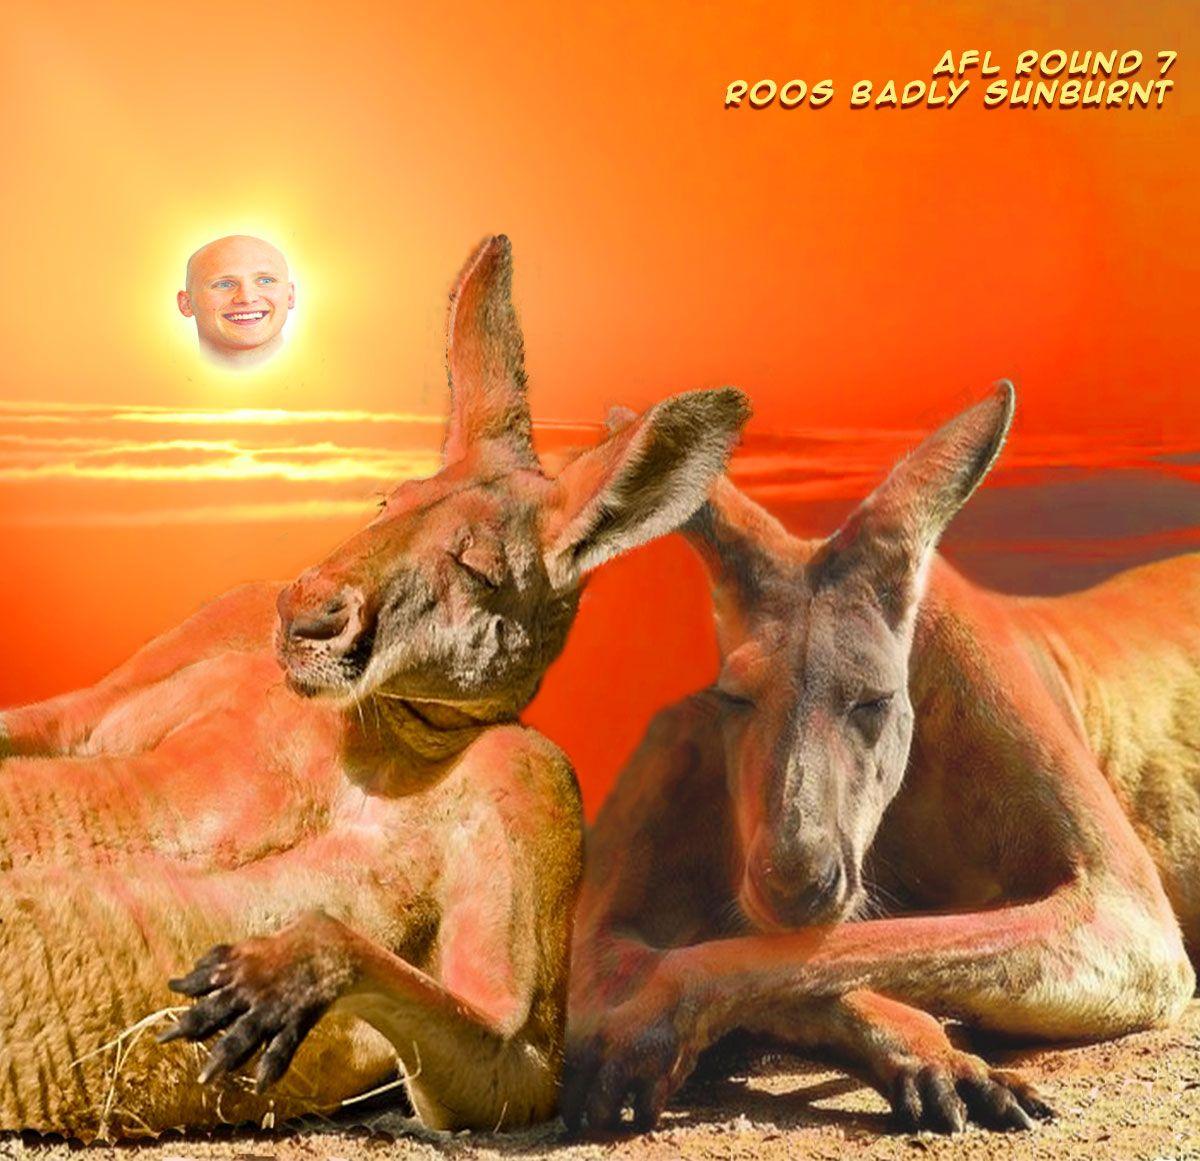 AFL-Round-7-Roos-Badly-Sunburnt.jpg